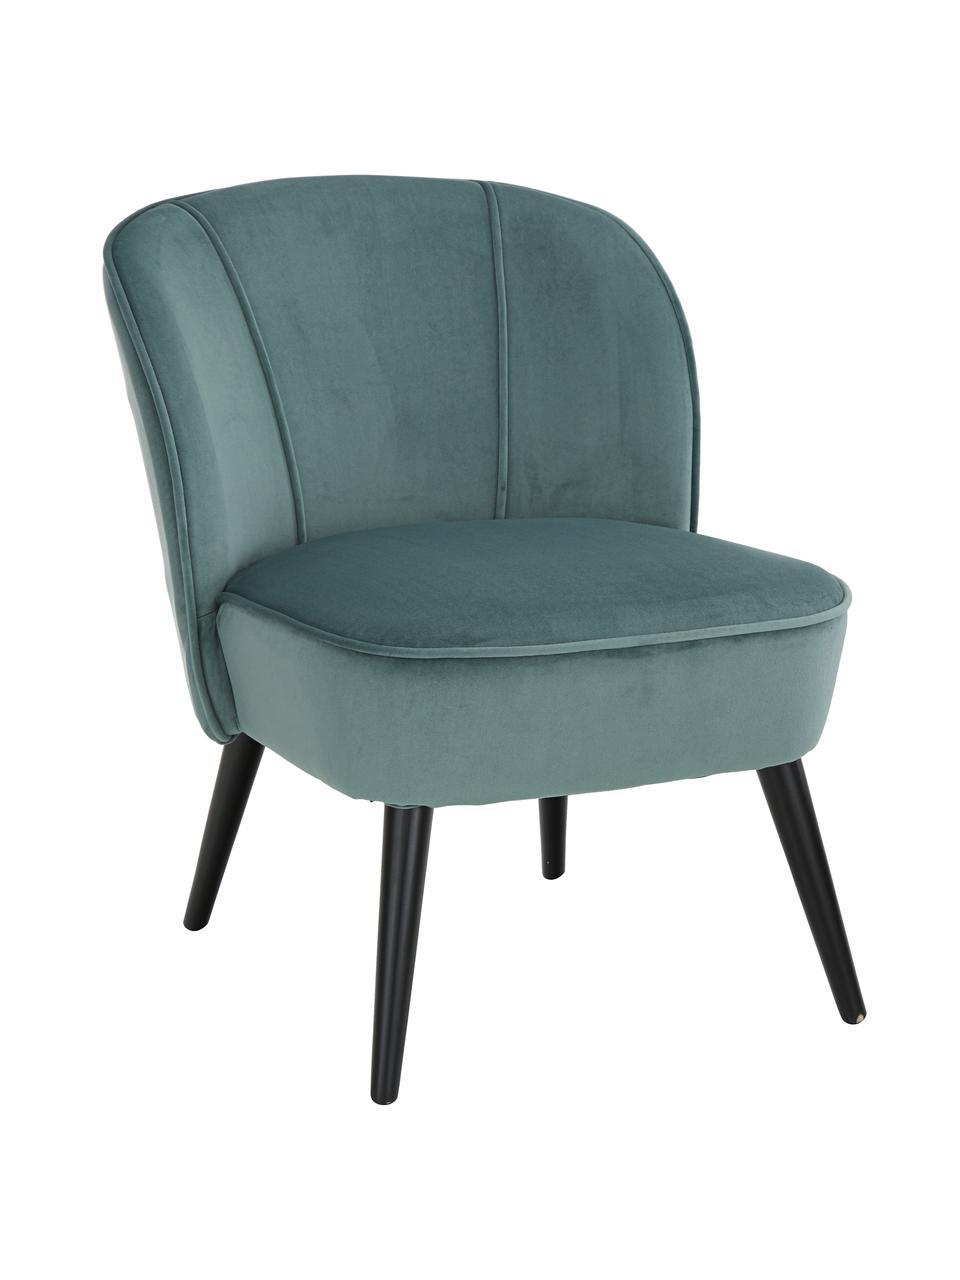 Samt-Cocktailsessel Lucky in Blaugrün, Bezug: Samt (Polyester) Der hoch, Füße: Kautschukholz, lackiert, Samt Blaugrün, B 59 x T 68 cm